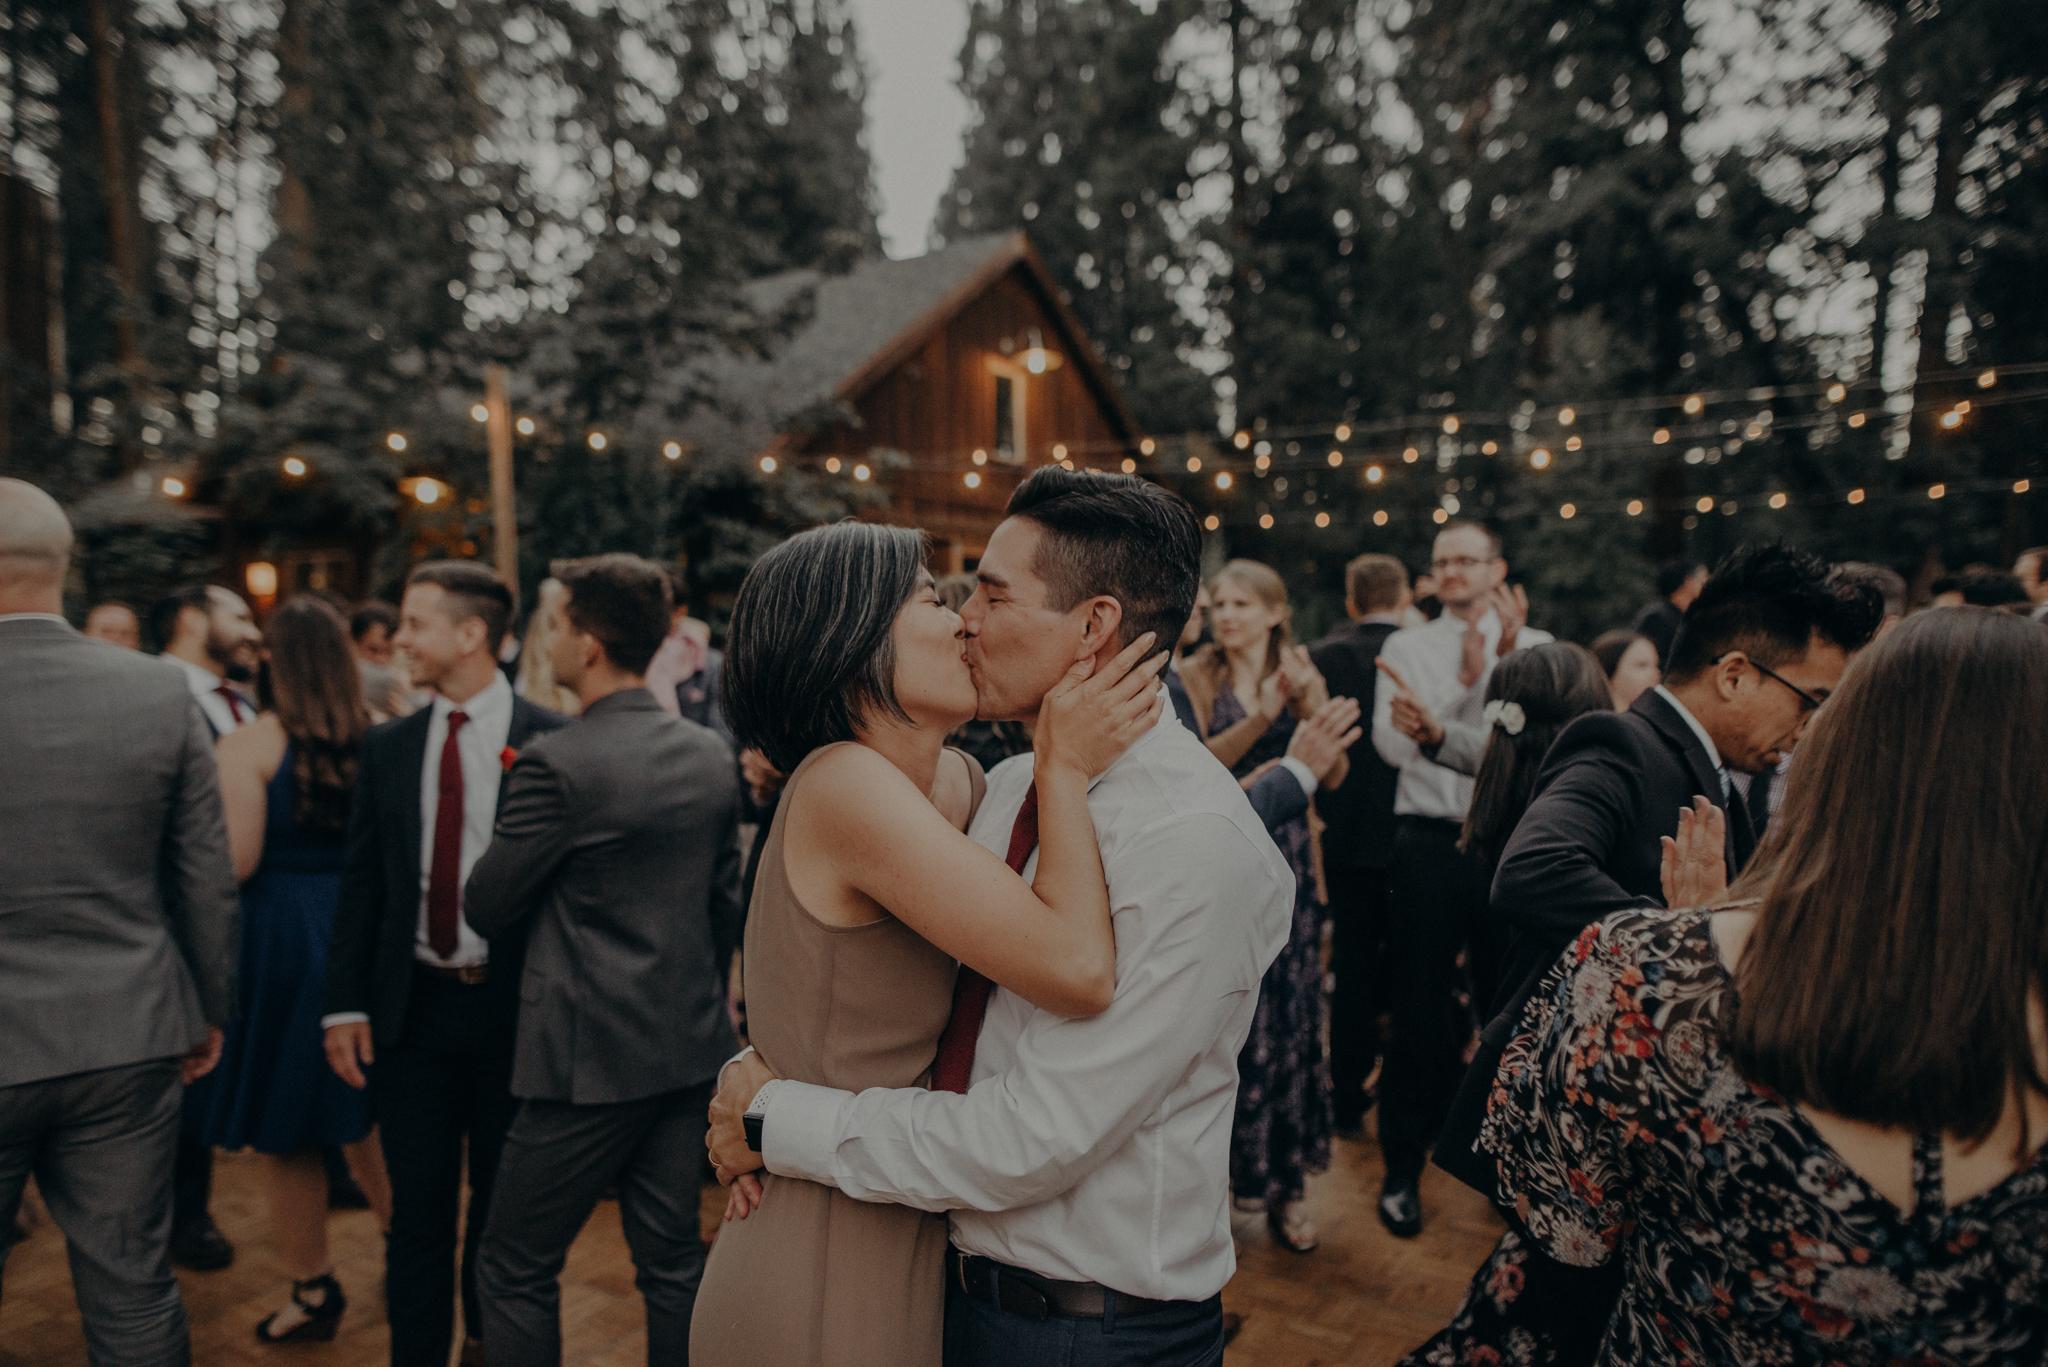 Yosemite Elopement Photographer - Evergreen Lodge Wedding Photographer - IsaiahAndTaylor.com-138.jpg